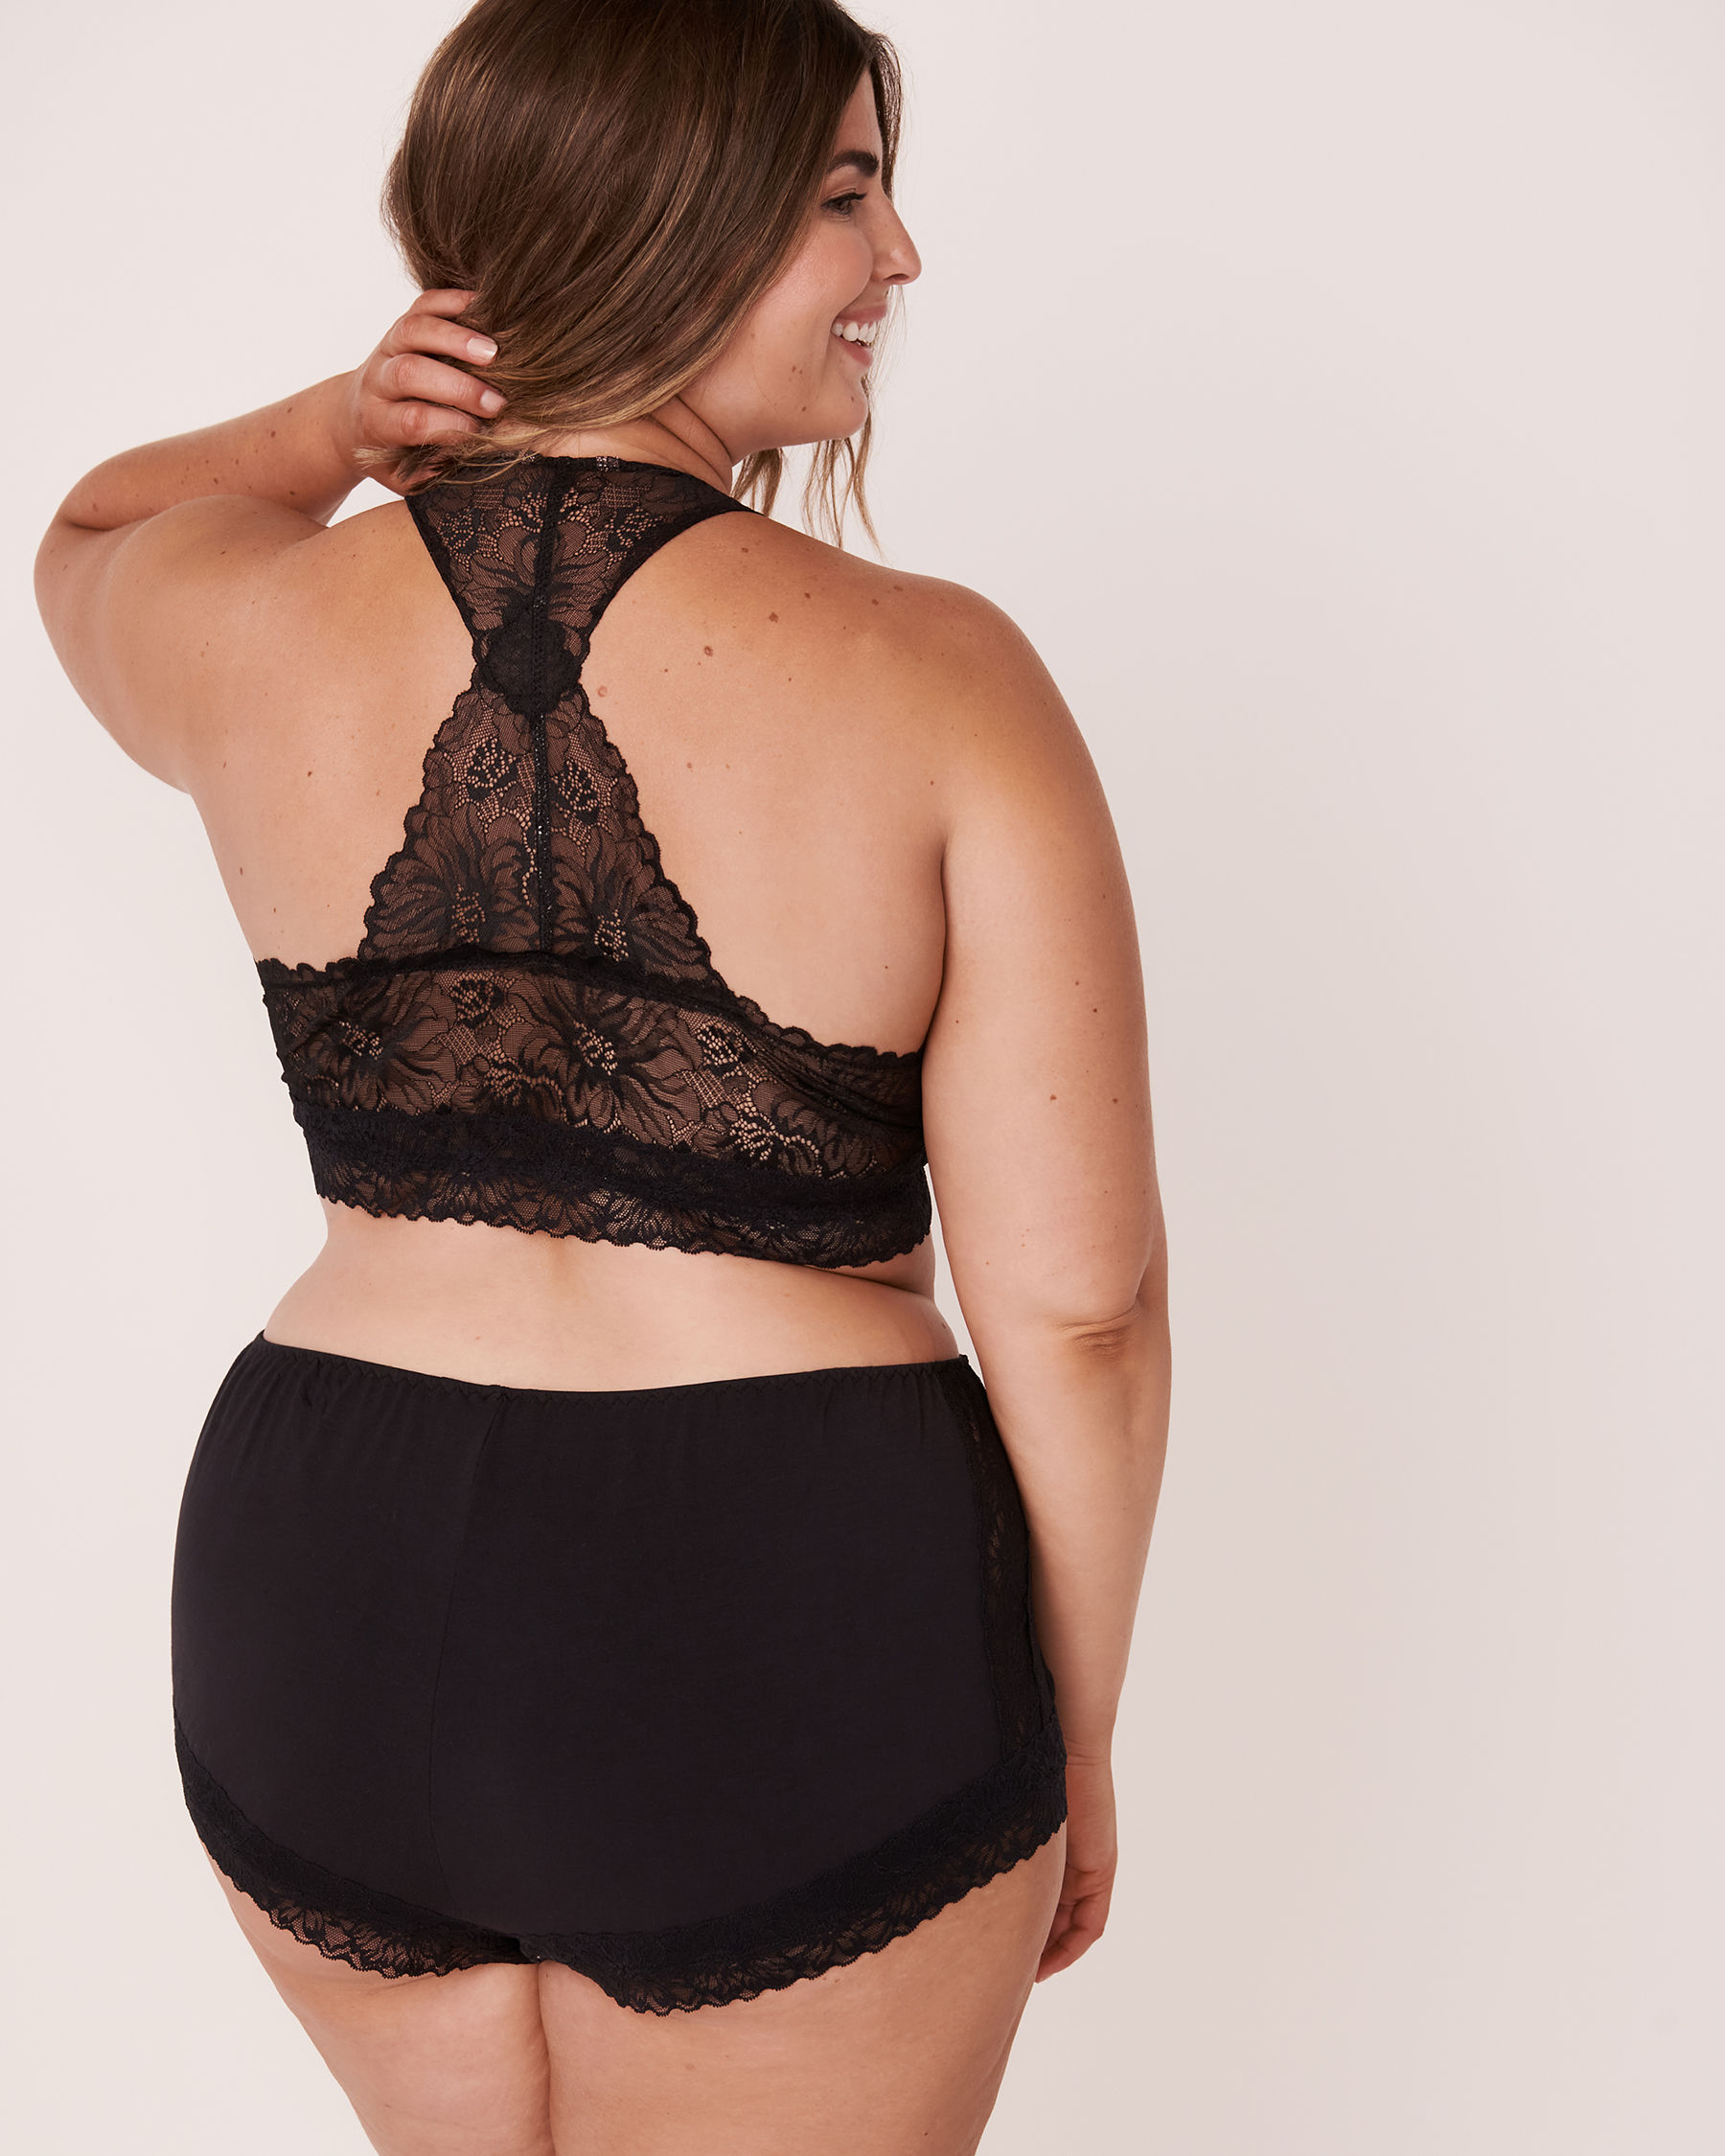 LA VIE EN ROSE Modal Lace Back Crop Cami Black 40100146 - View2